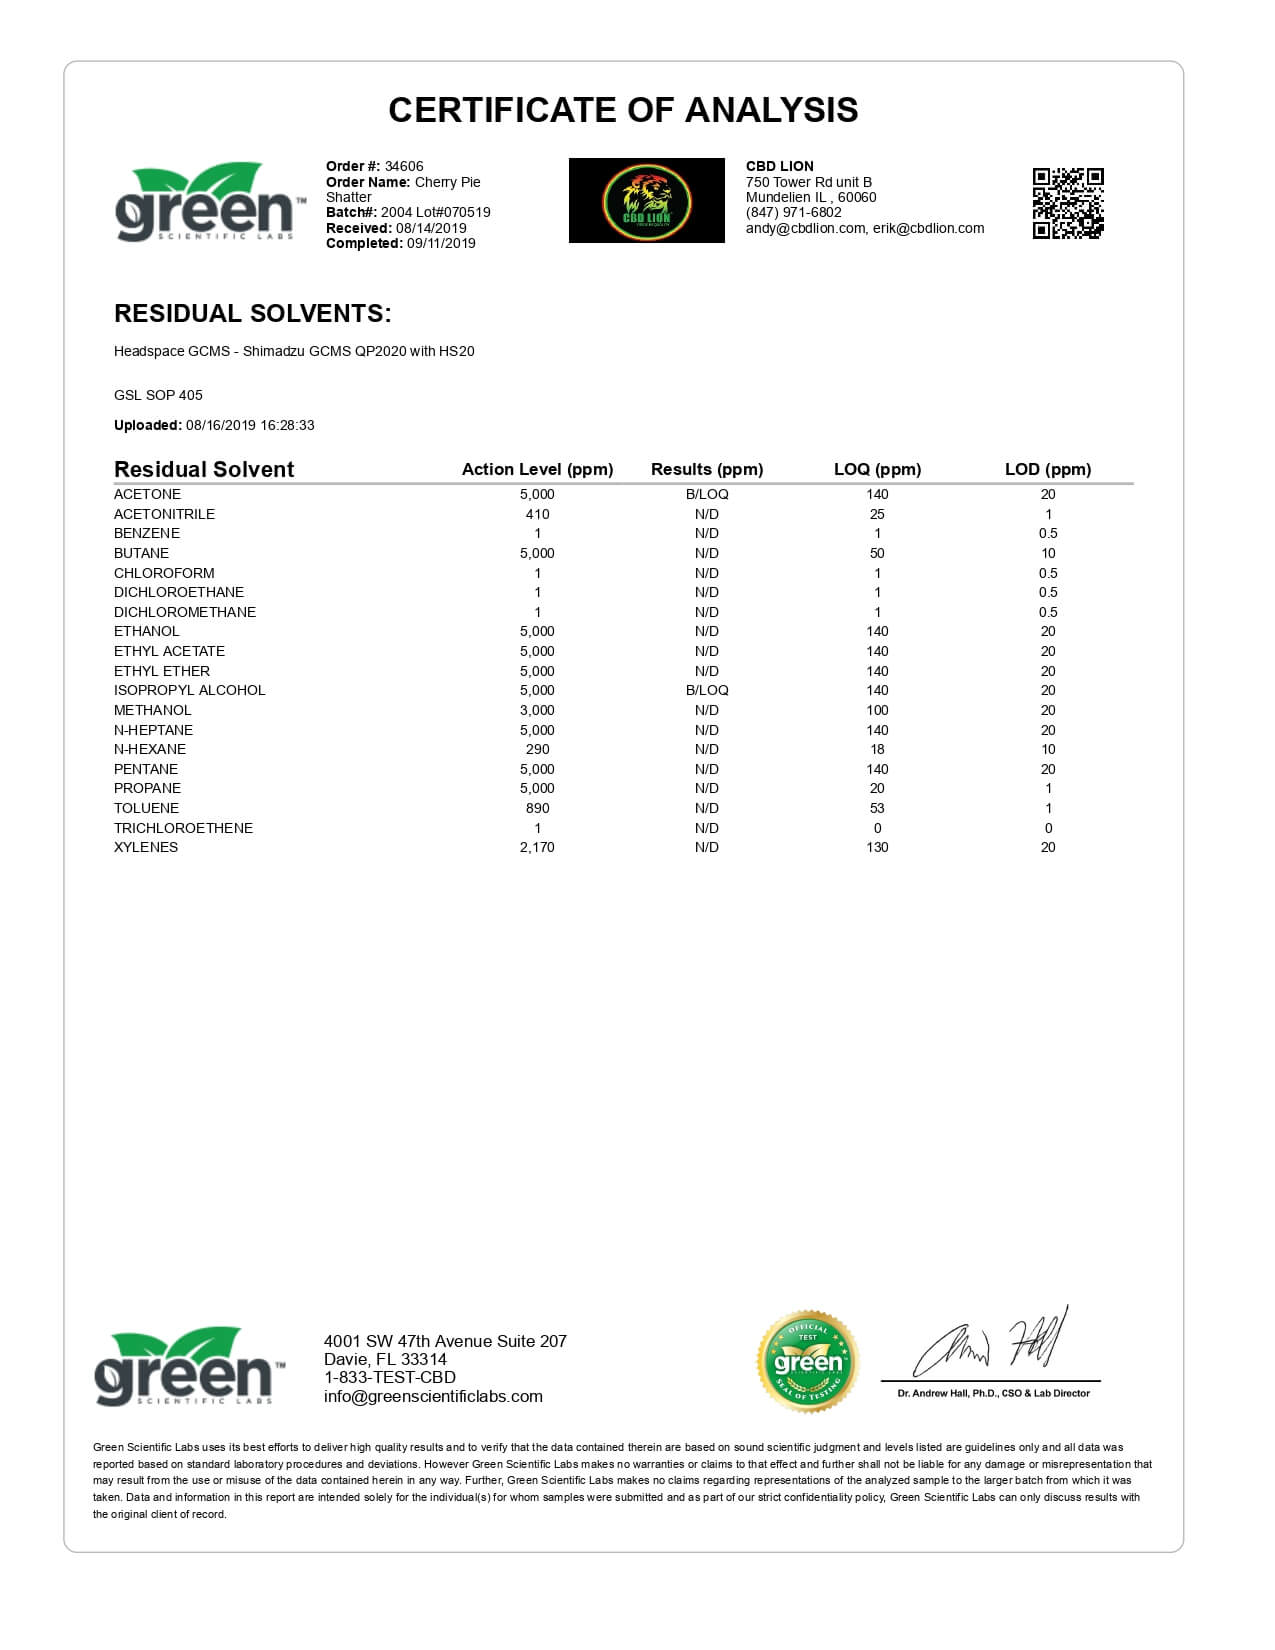 CBD Lion CBD Concentrate Cherry Pie Shatter 1g Lab Report